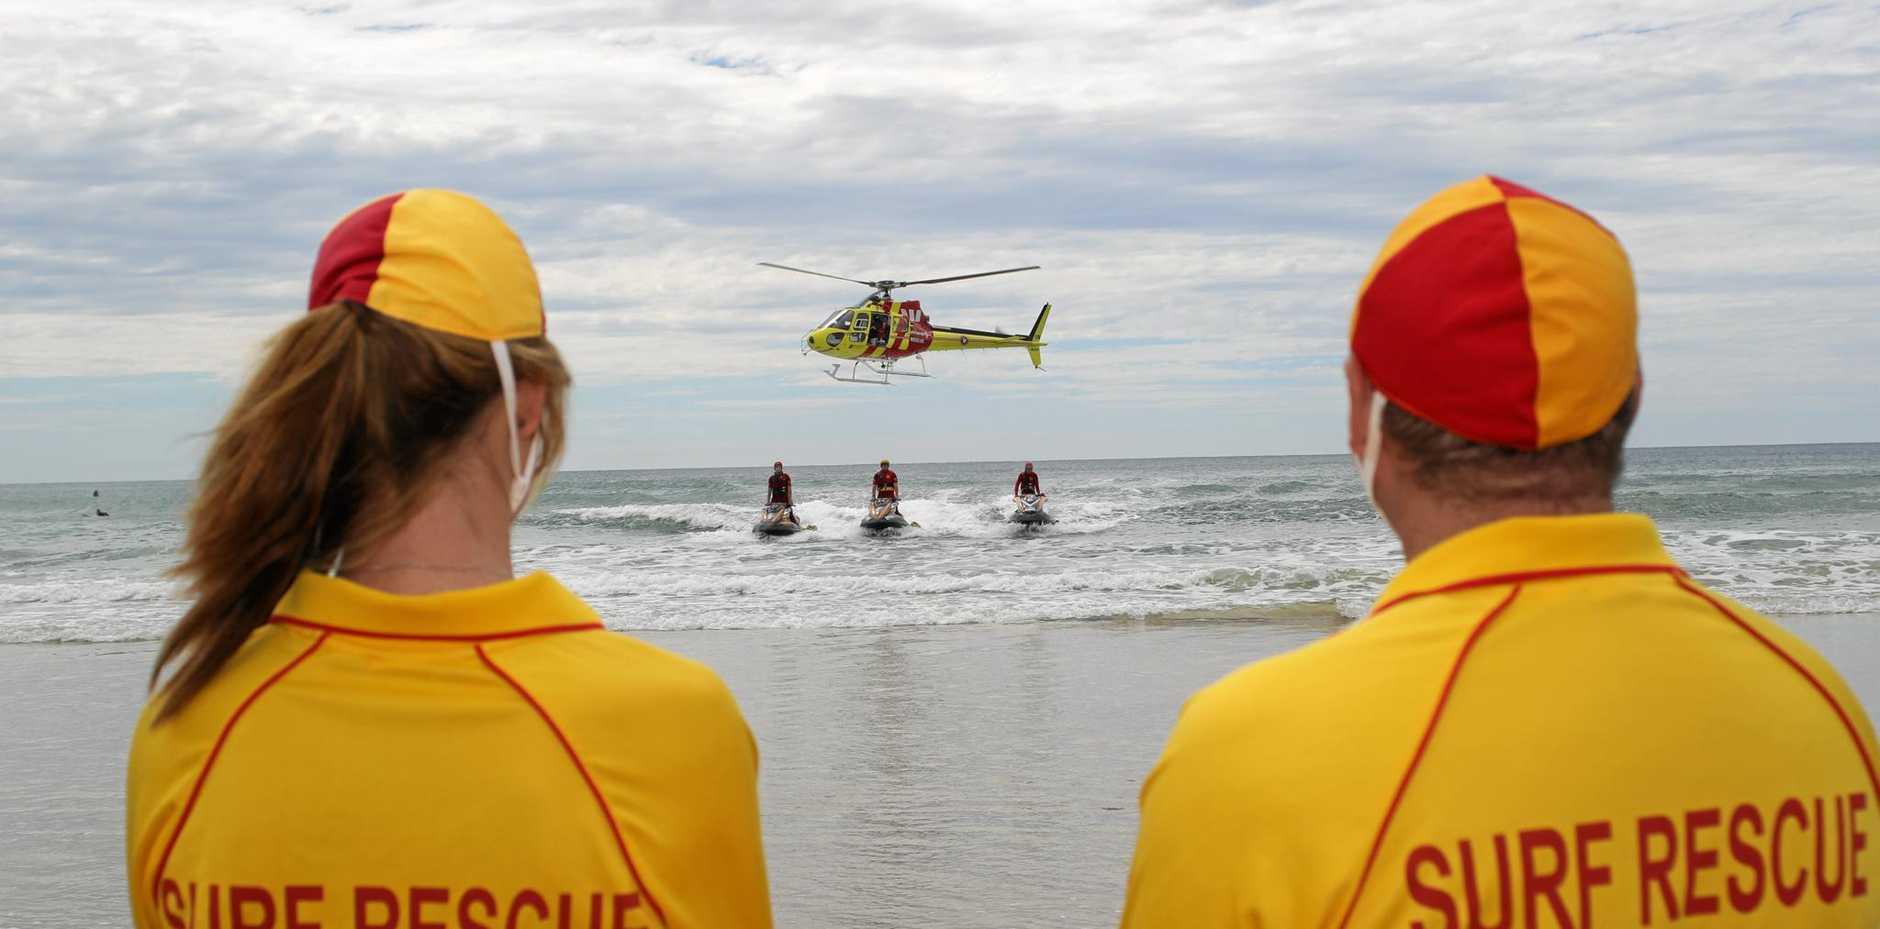 Maroochy Surf Club lifesavers keep an eye on the beach.